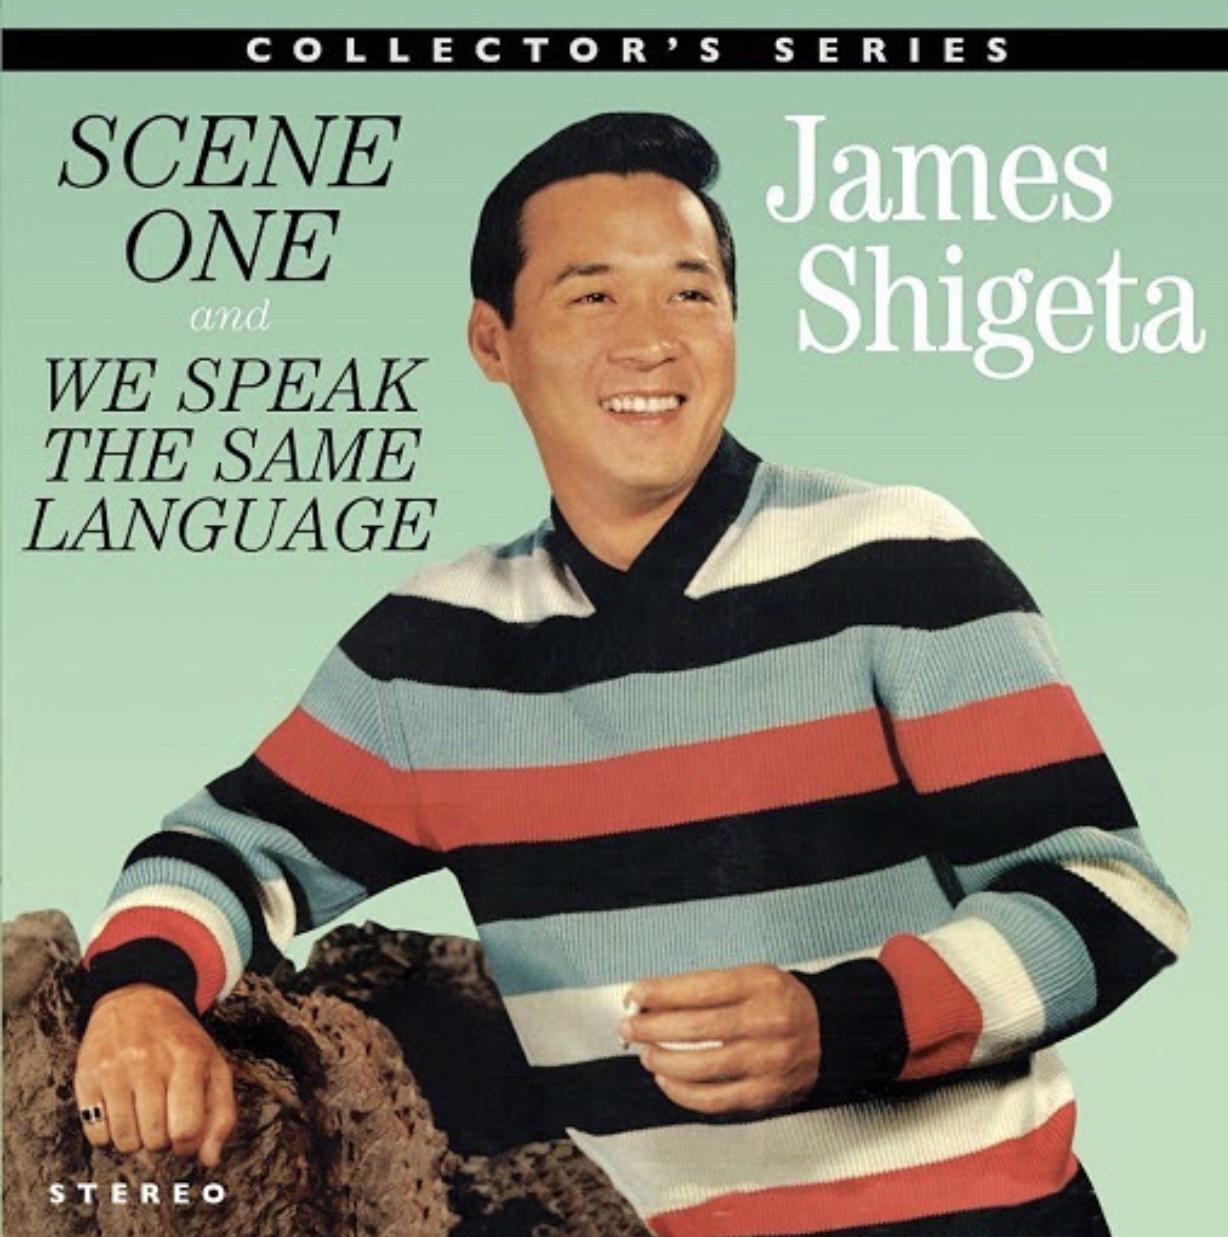 James Shigeta: Asian Menswear Spotlight Series